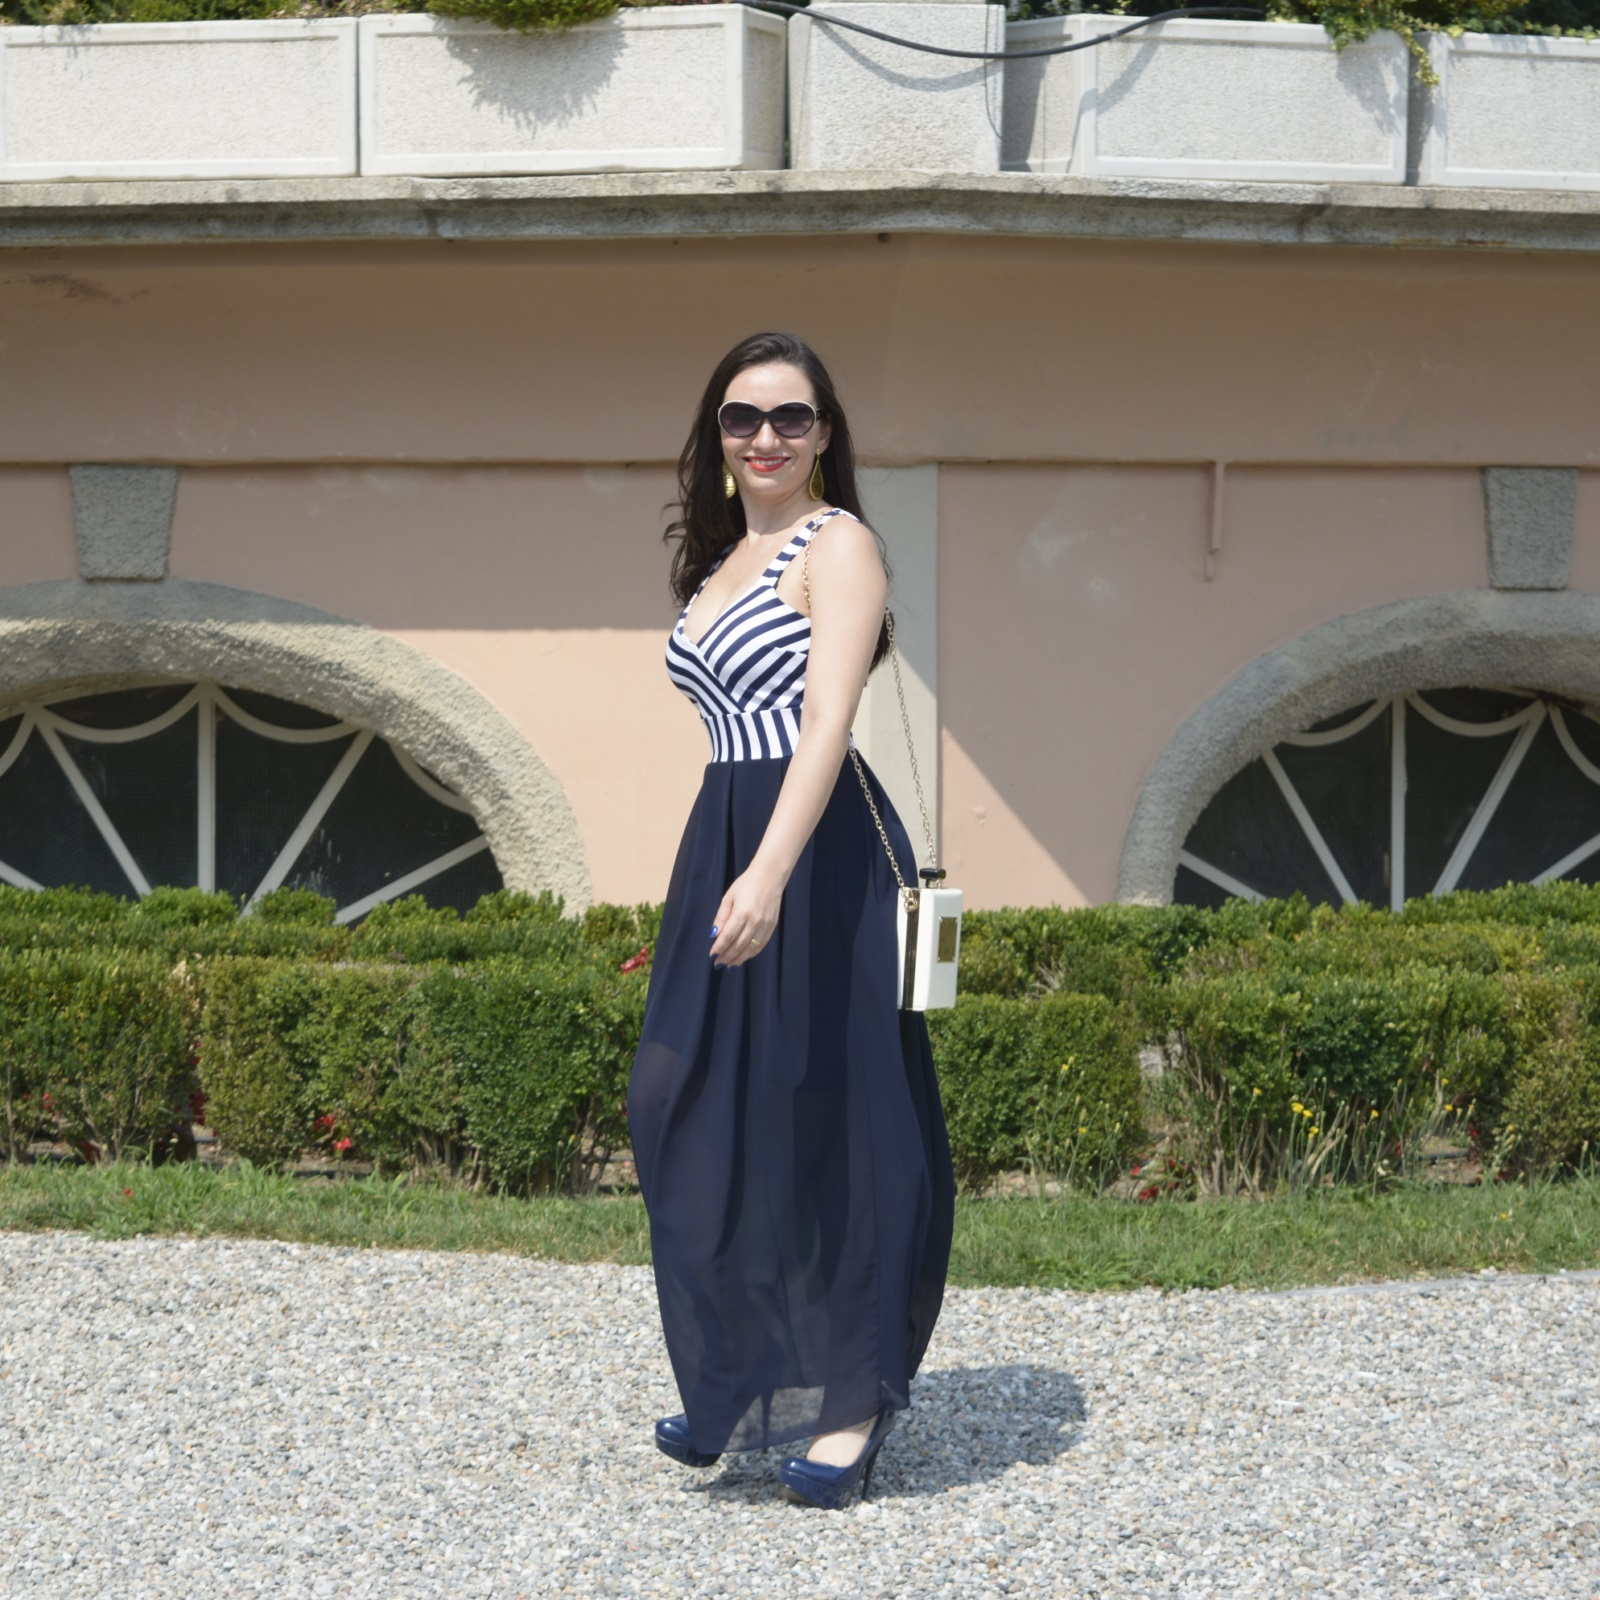 vestido-estilo-navy-longo-nathália-ferrara12